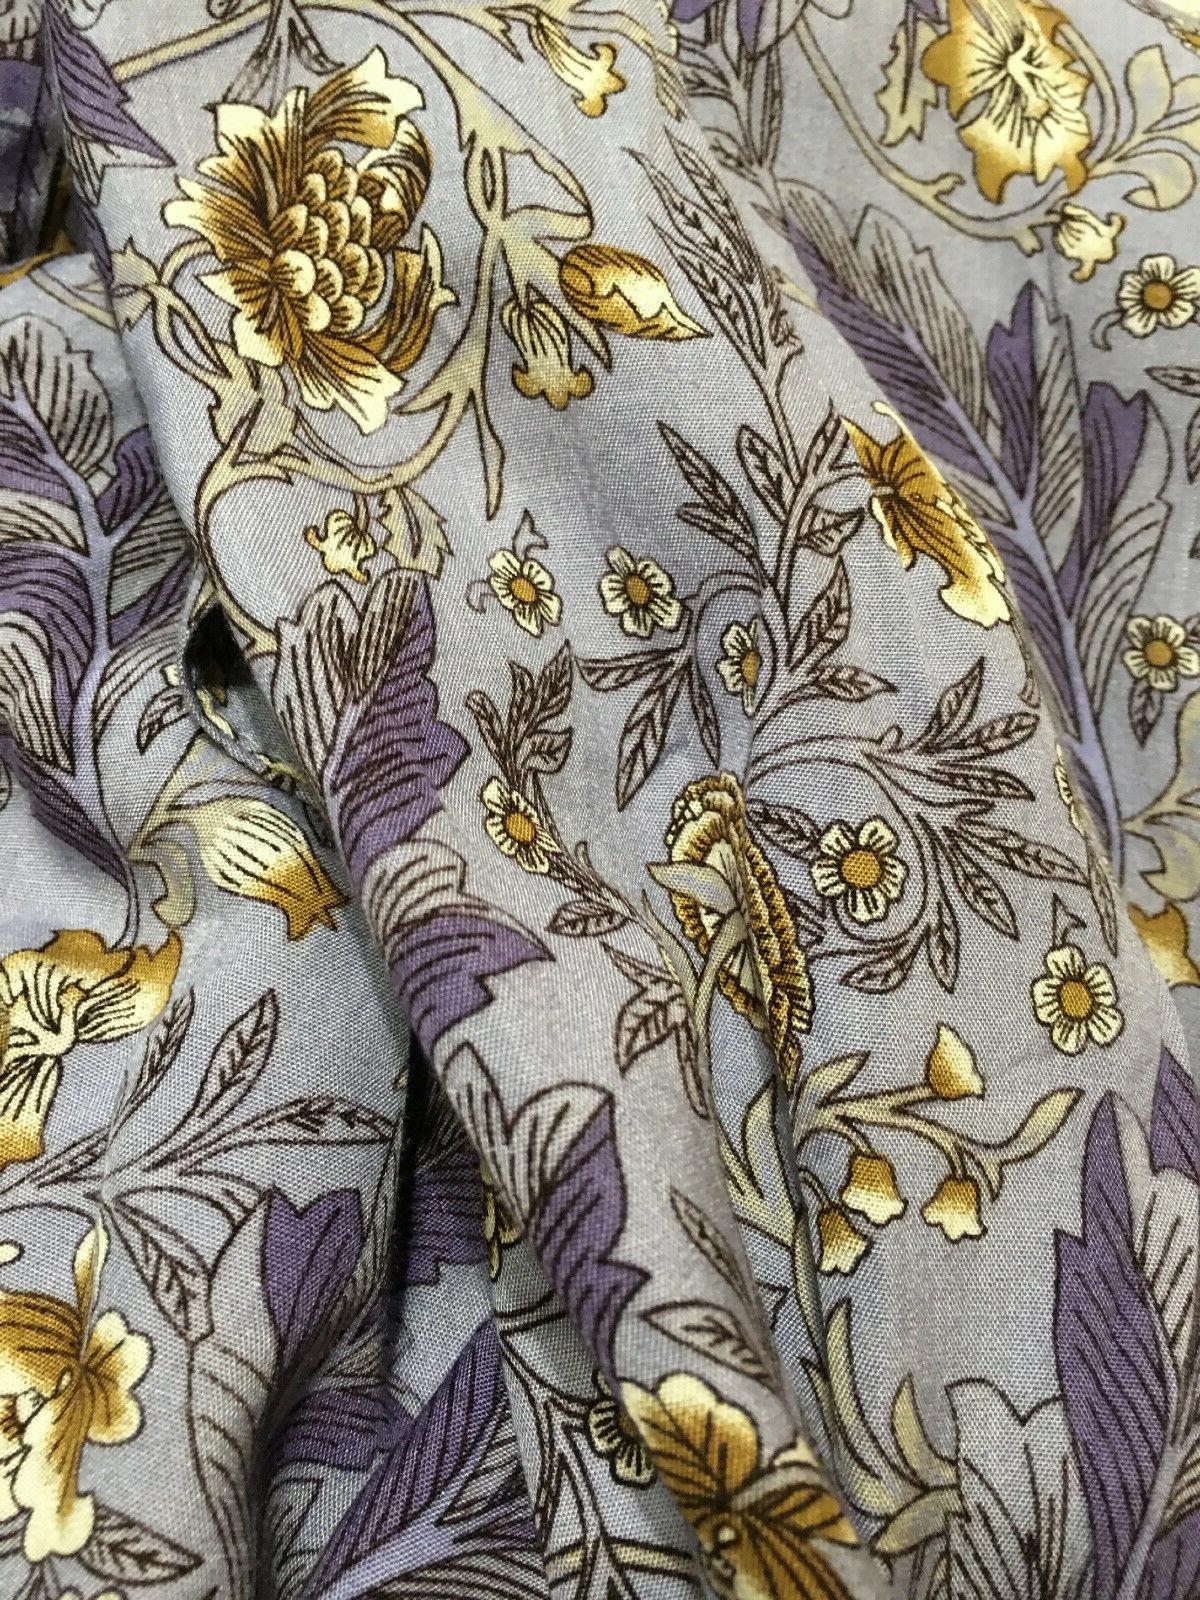 Floral Paisley Duster Kimono Coverup